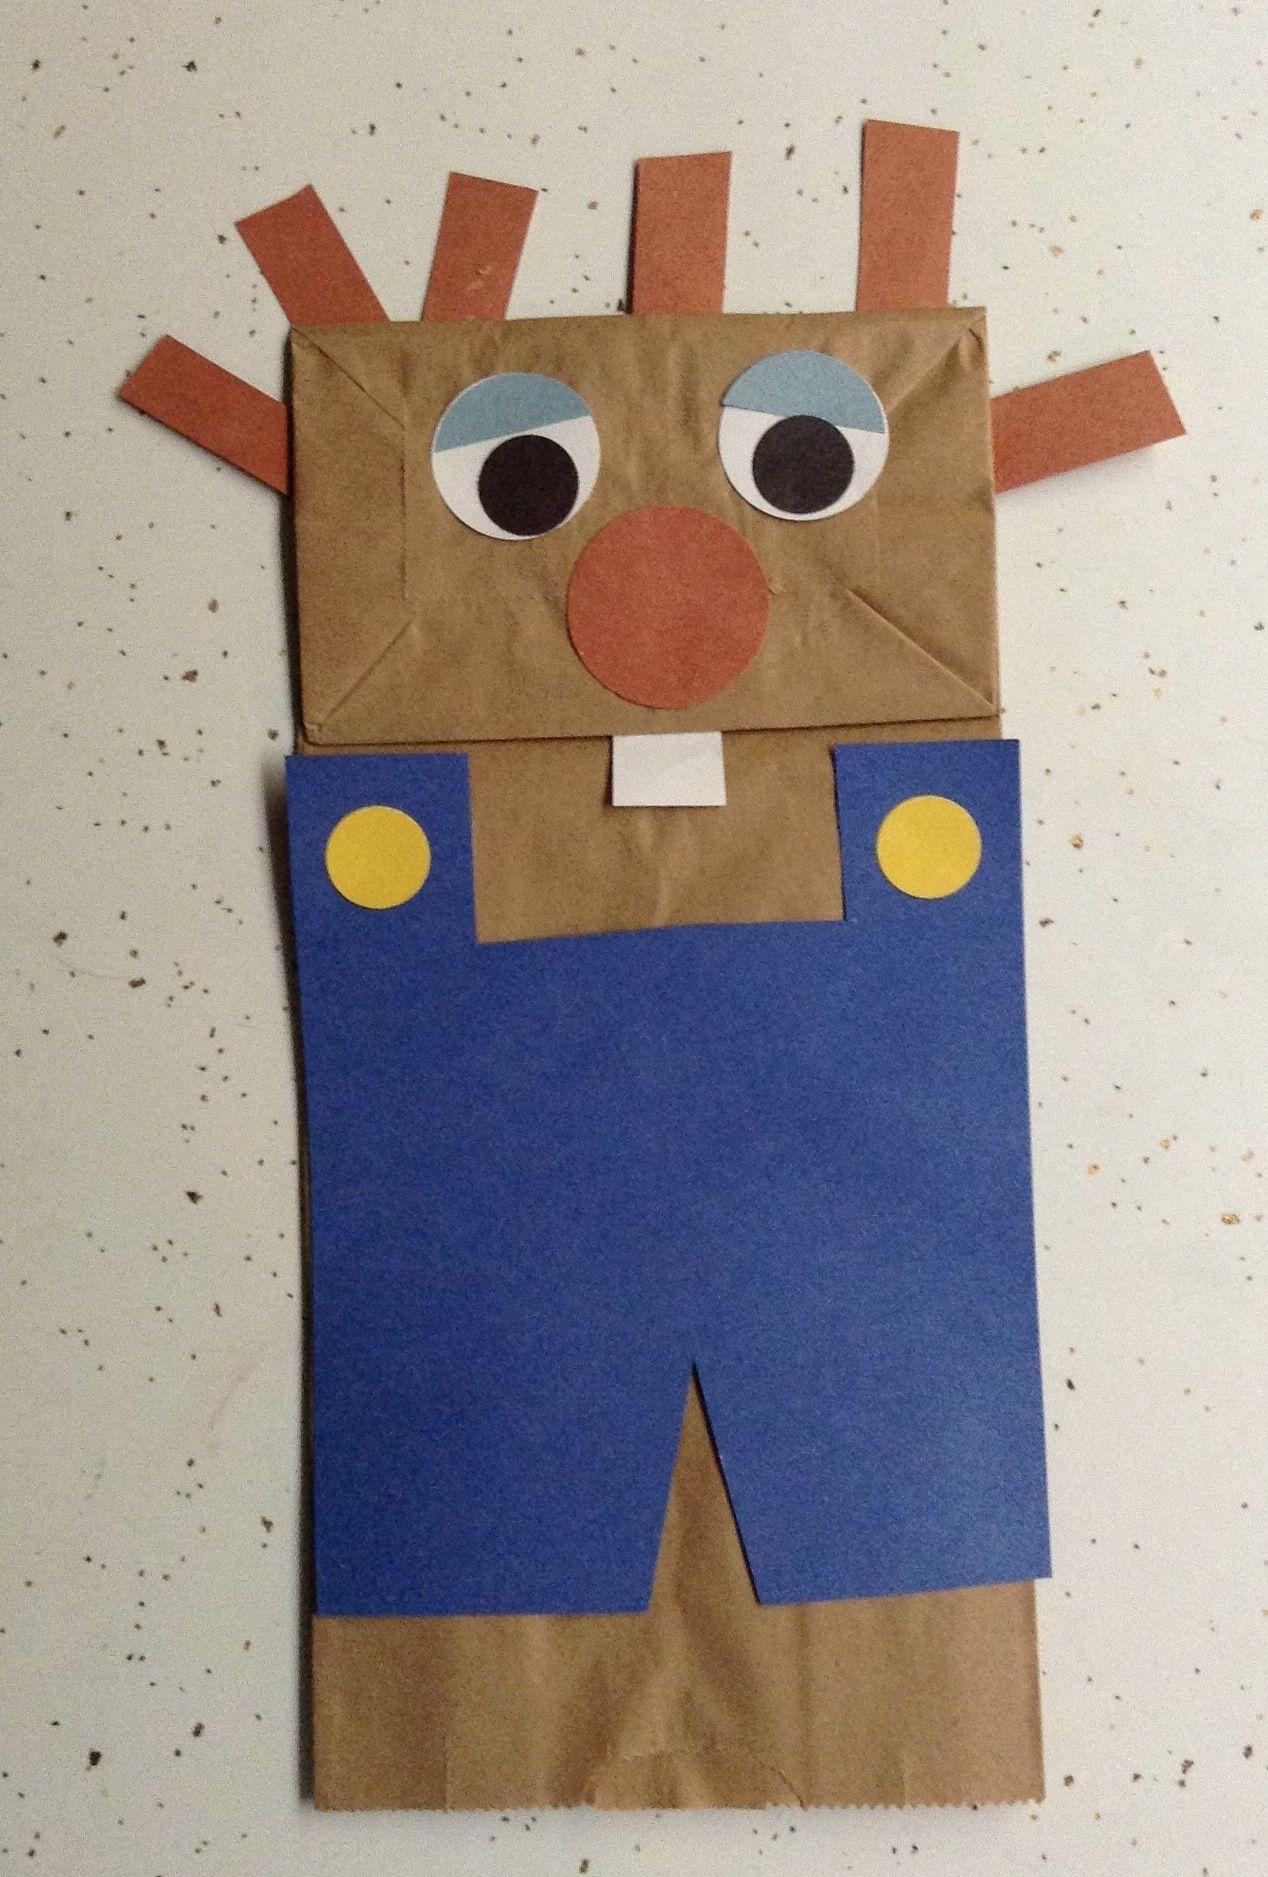 My Very Own Little Critter Creation Puppet